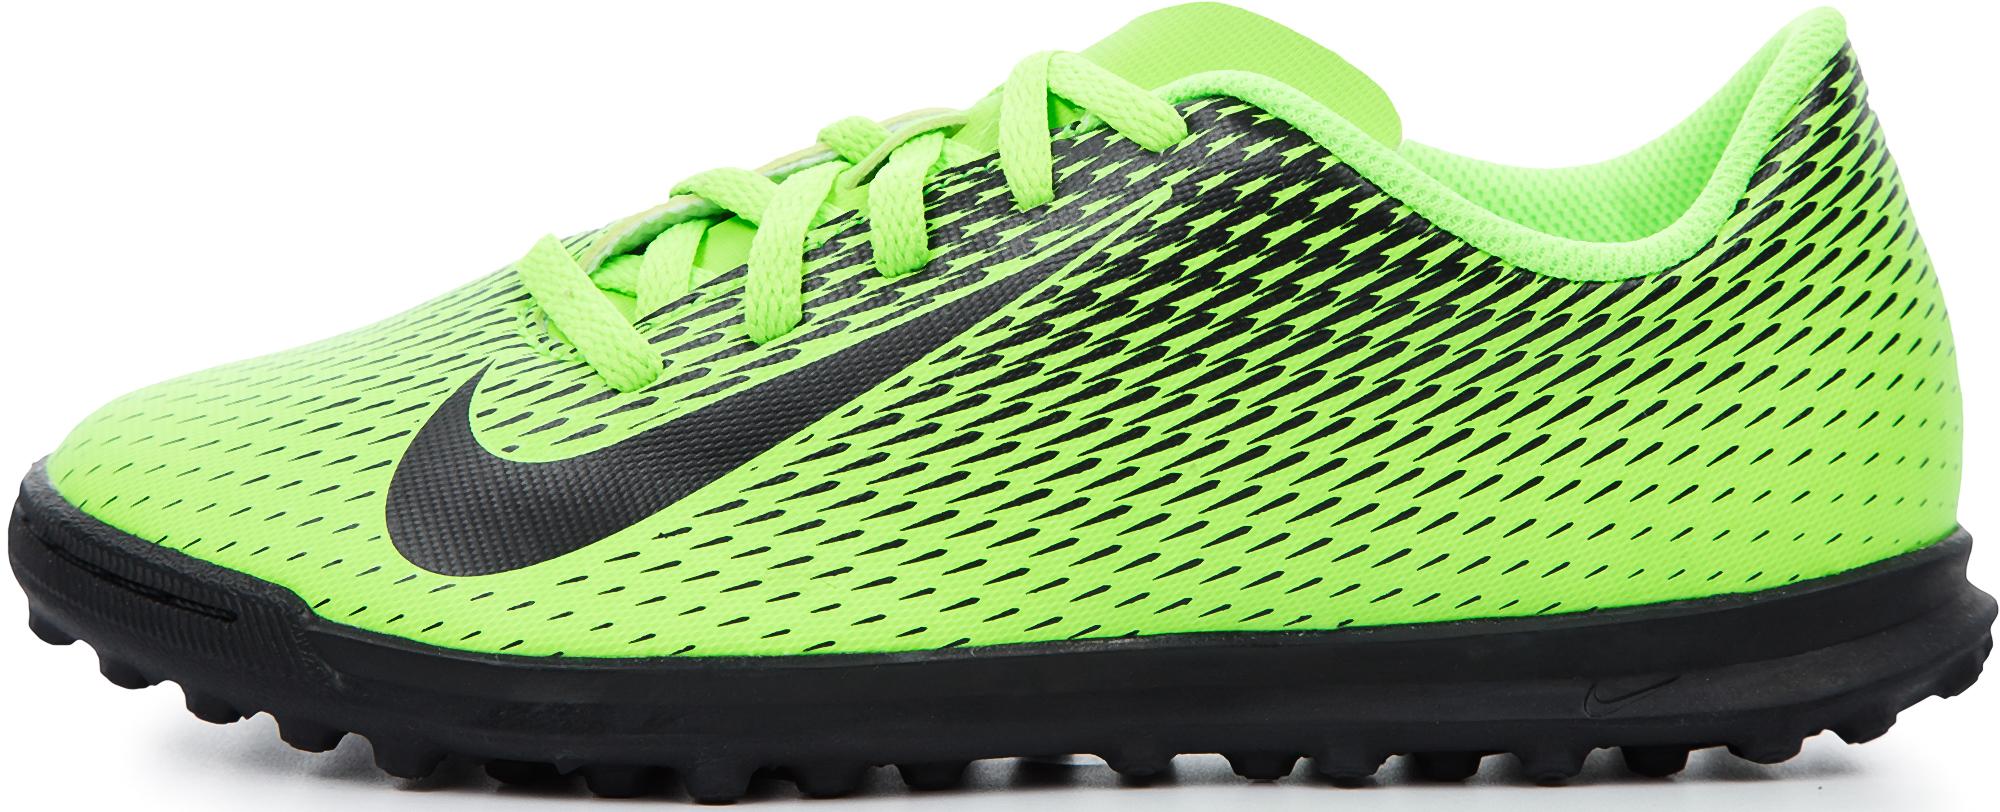 Nike Бутсы для мальчиков Nike Bravatax Ii Tf, размер 31 nike бутсы мужские nike nike bravatax ii tf